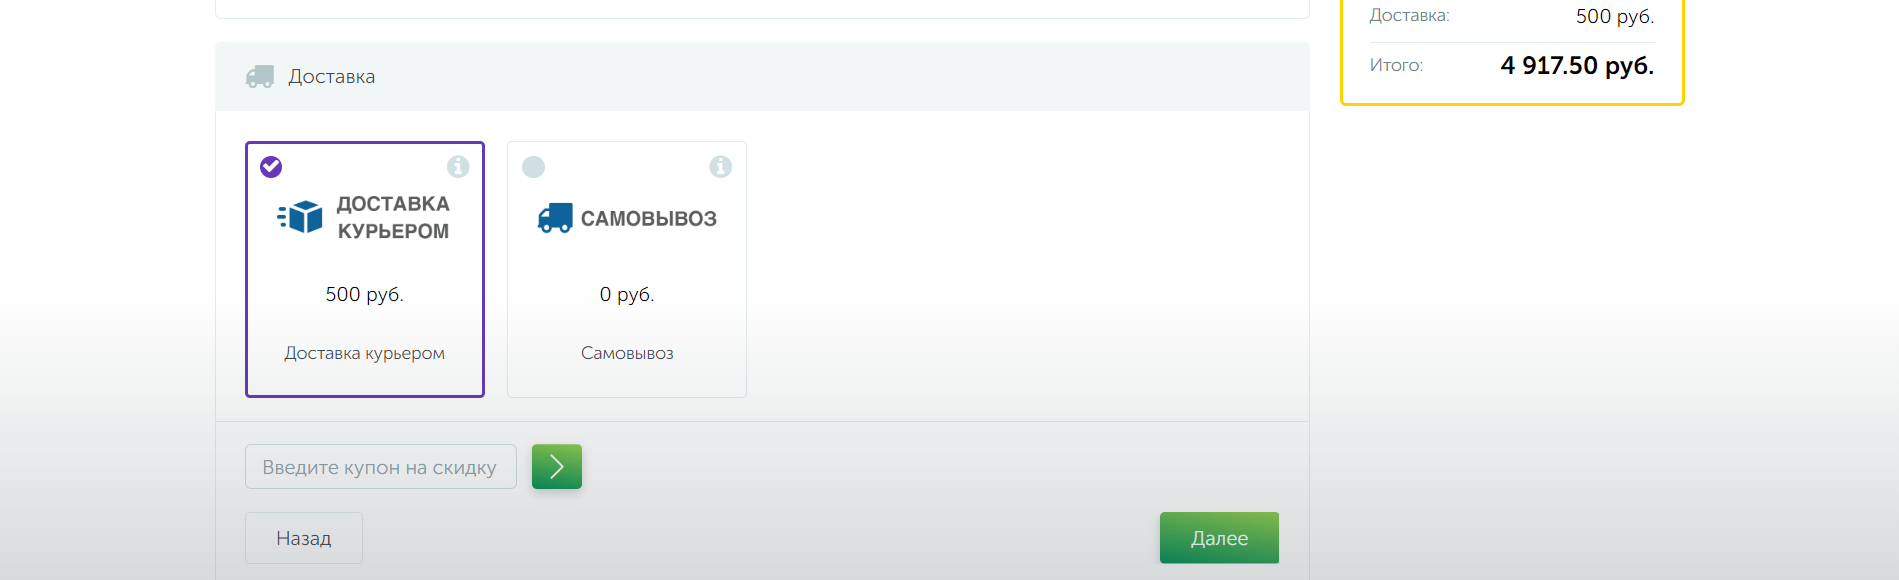 ЭЛЕКТРОСИЛА NEXT - Службы доставки 1С-Битрикс